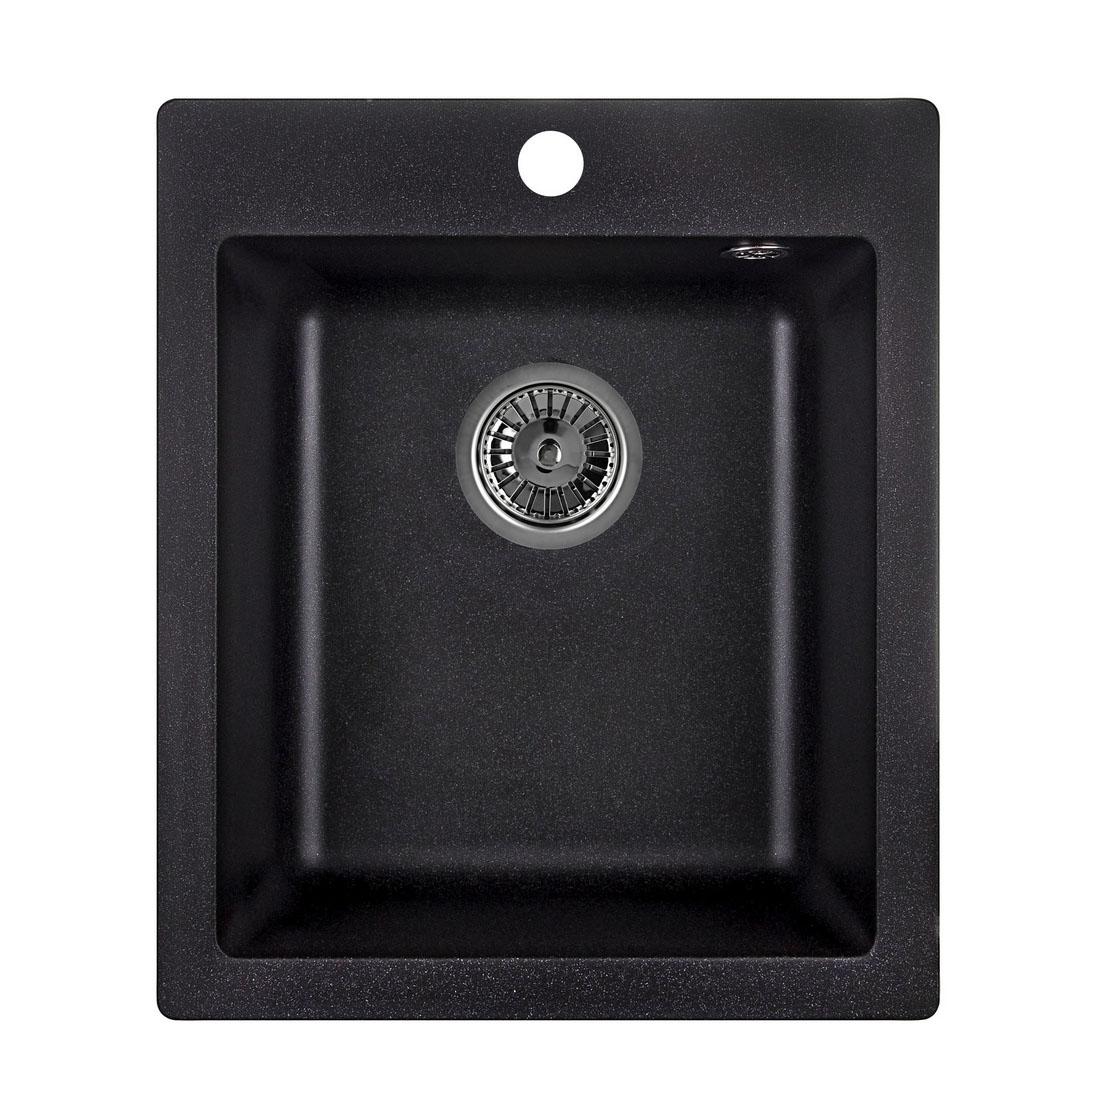 Кухонная мойка Granula GR-4201 415х490 черный